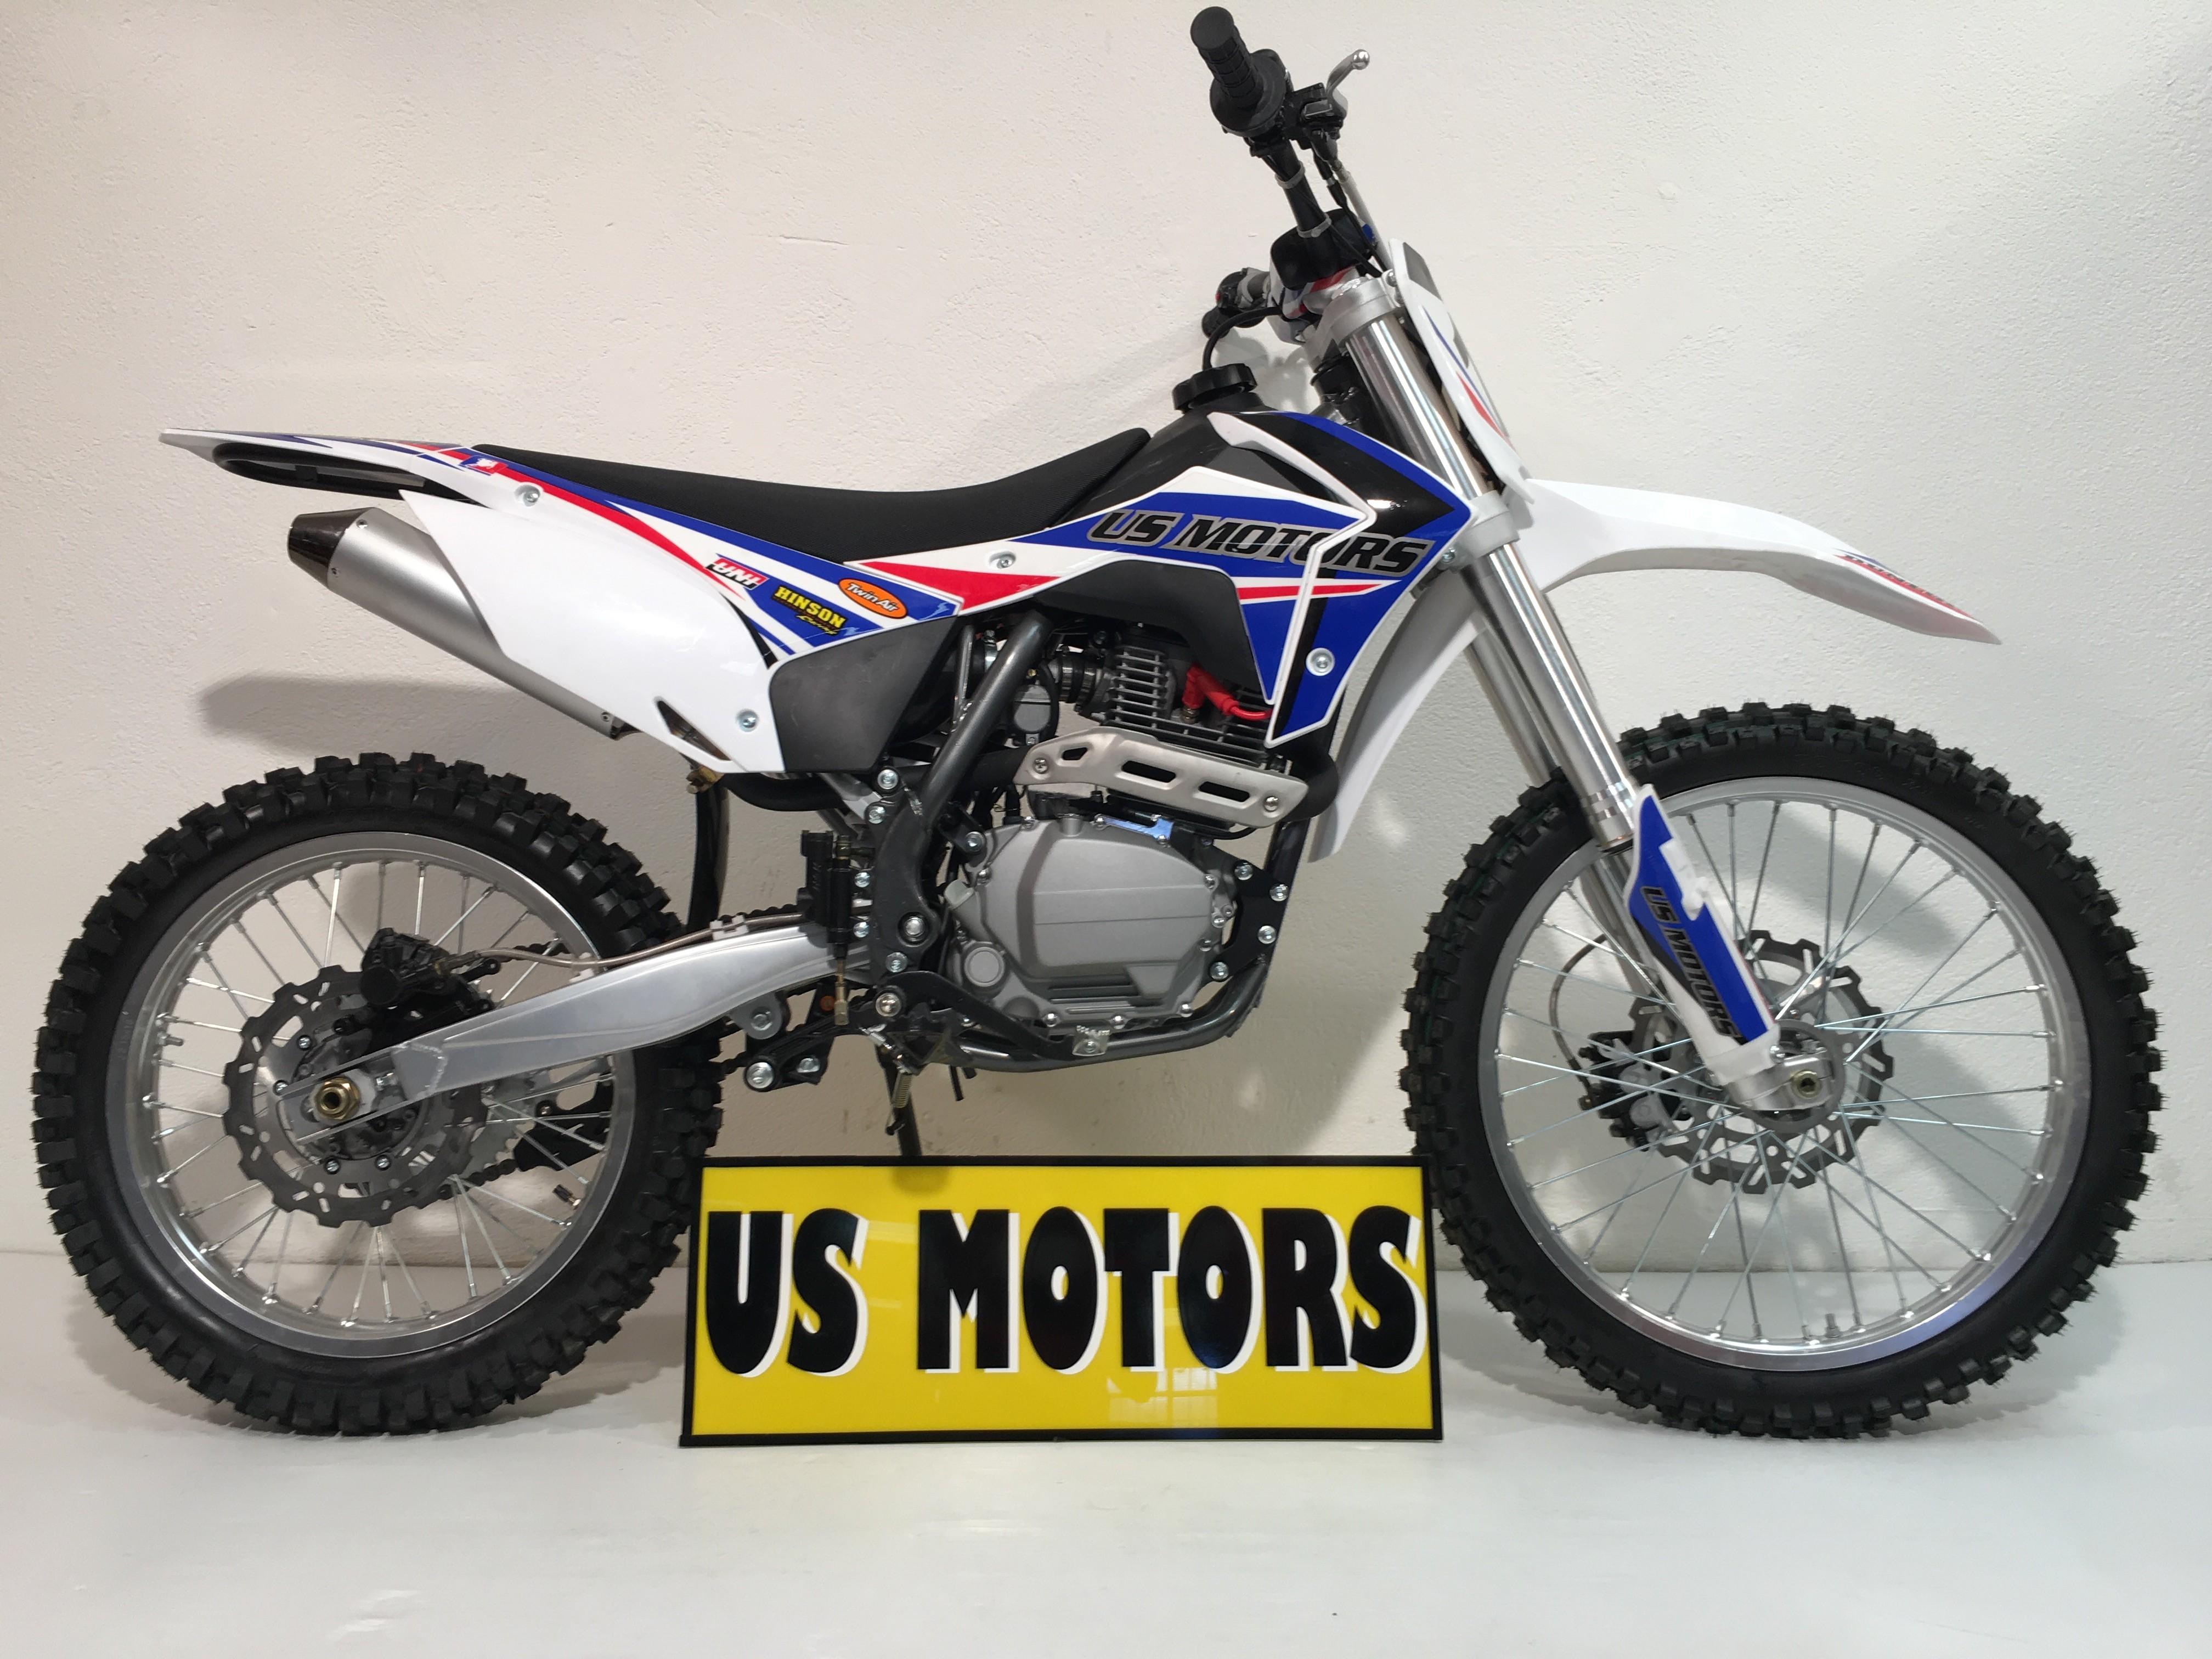 Nouveau Photos De Moto Cross A Imprimer